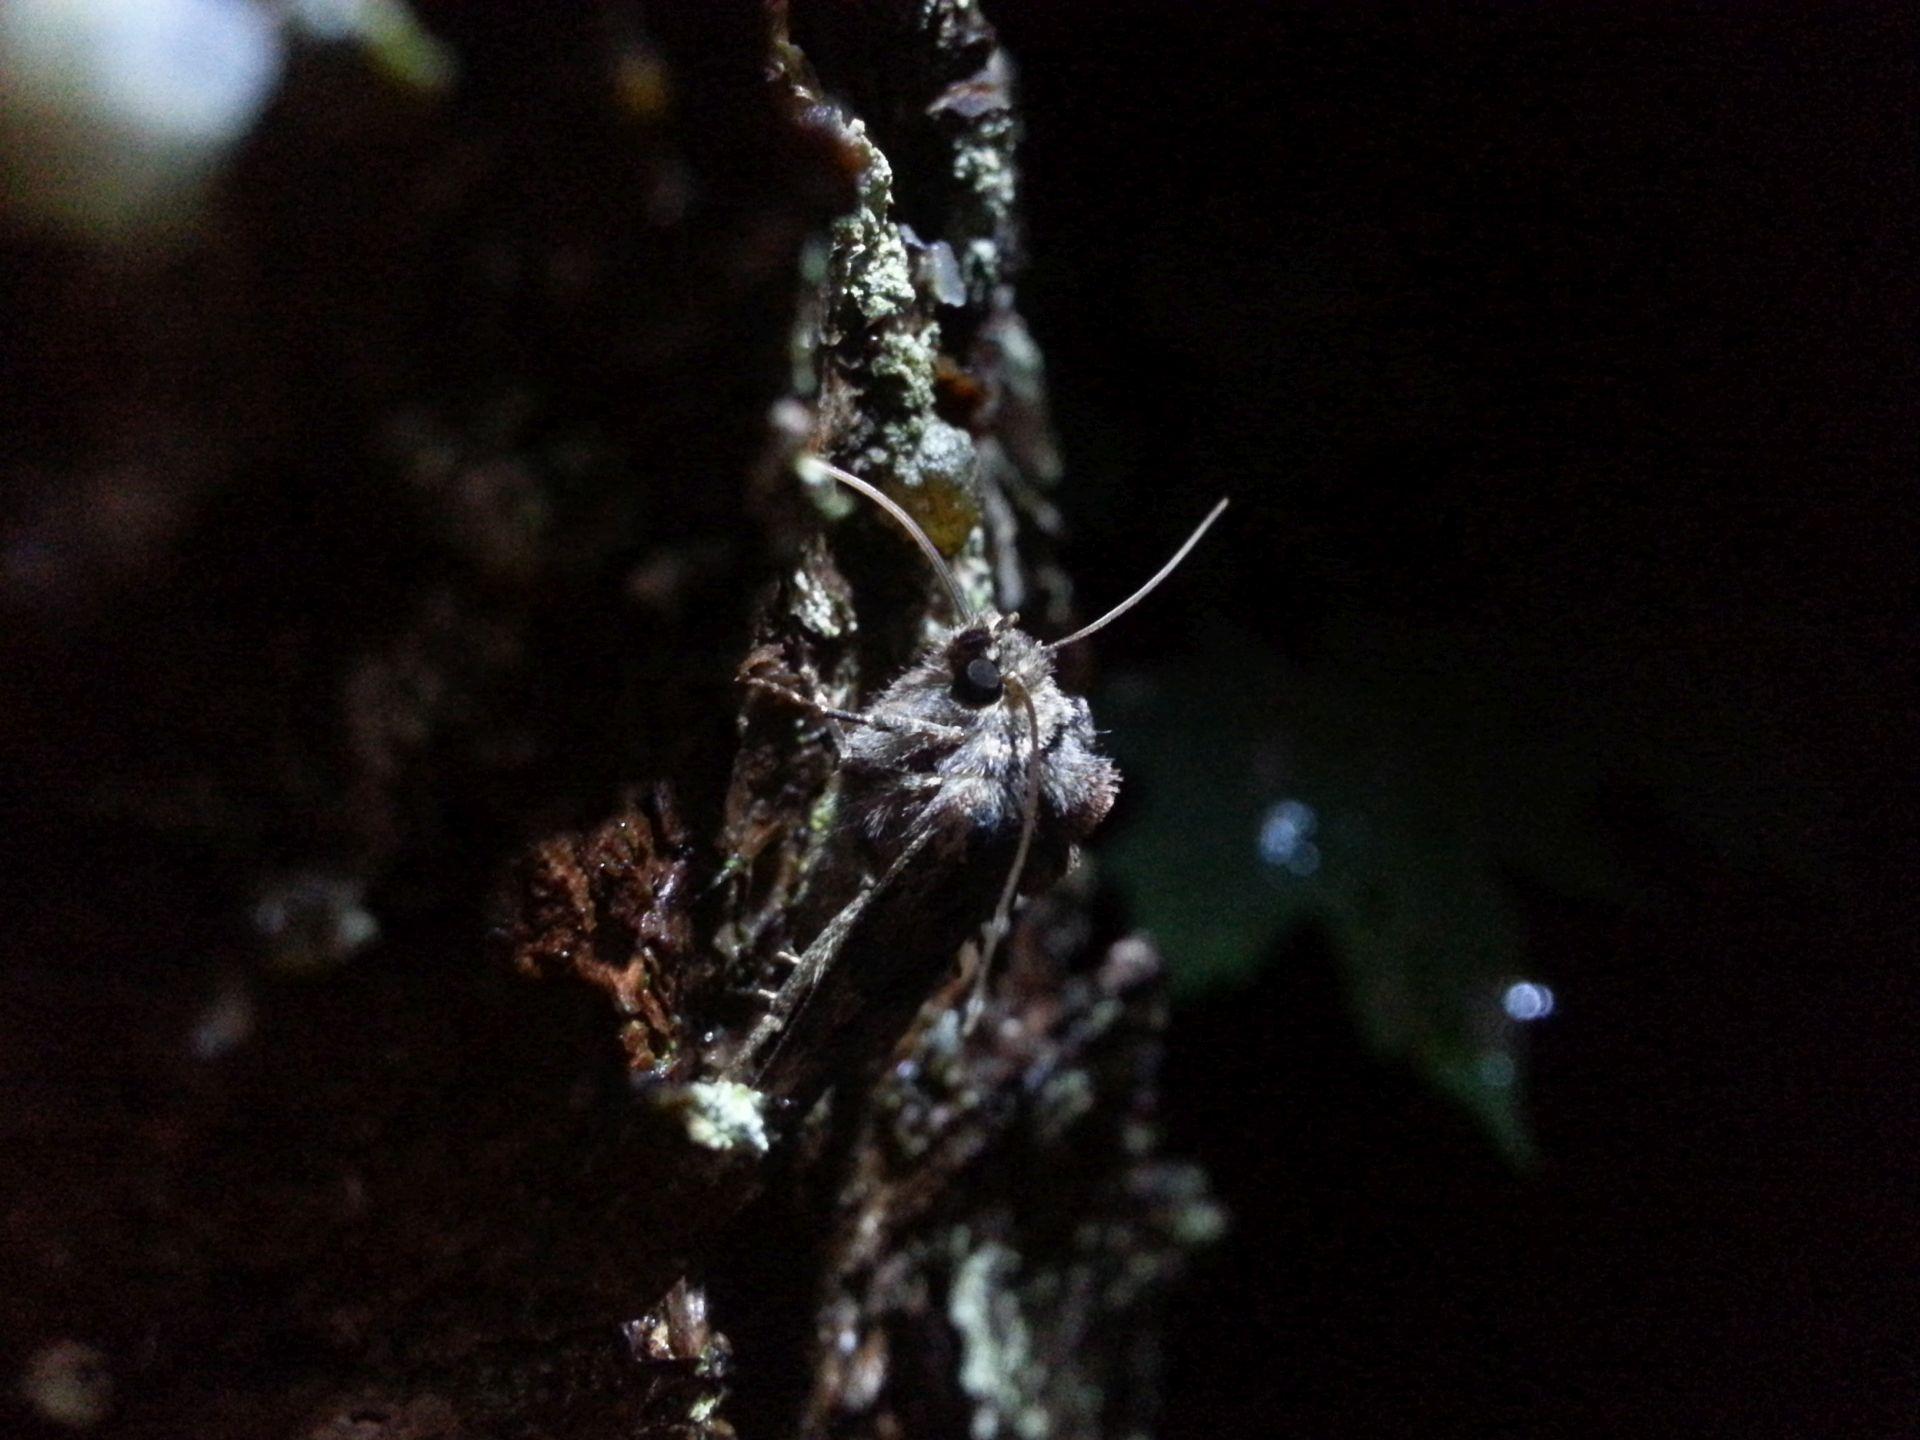 Warsztaty entomologiczne